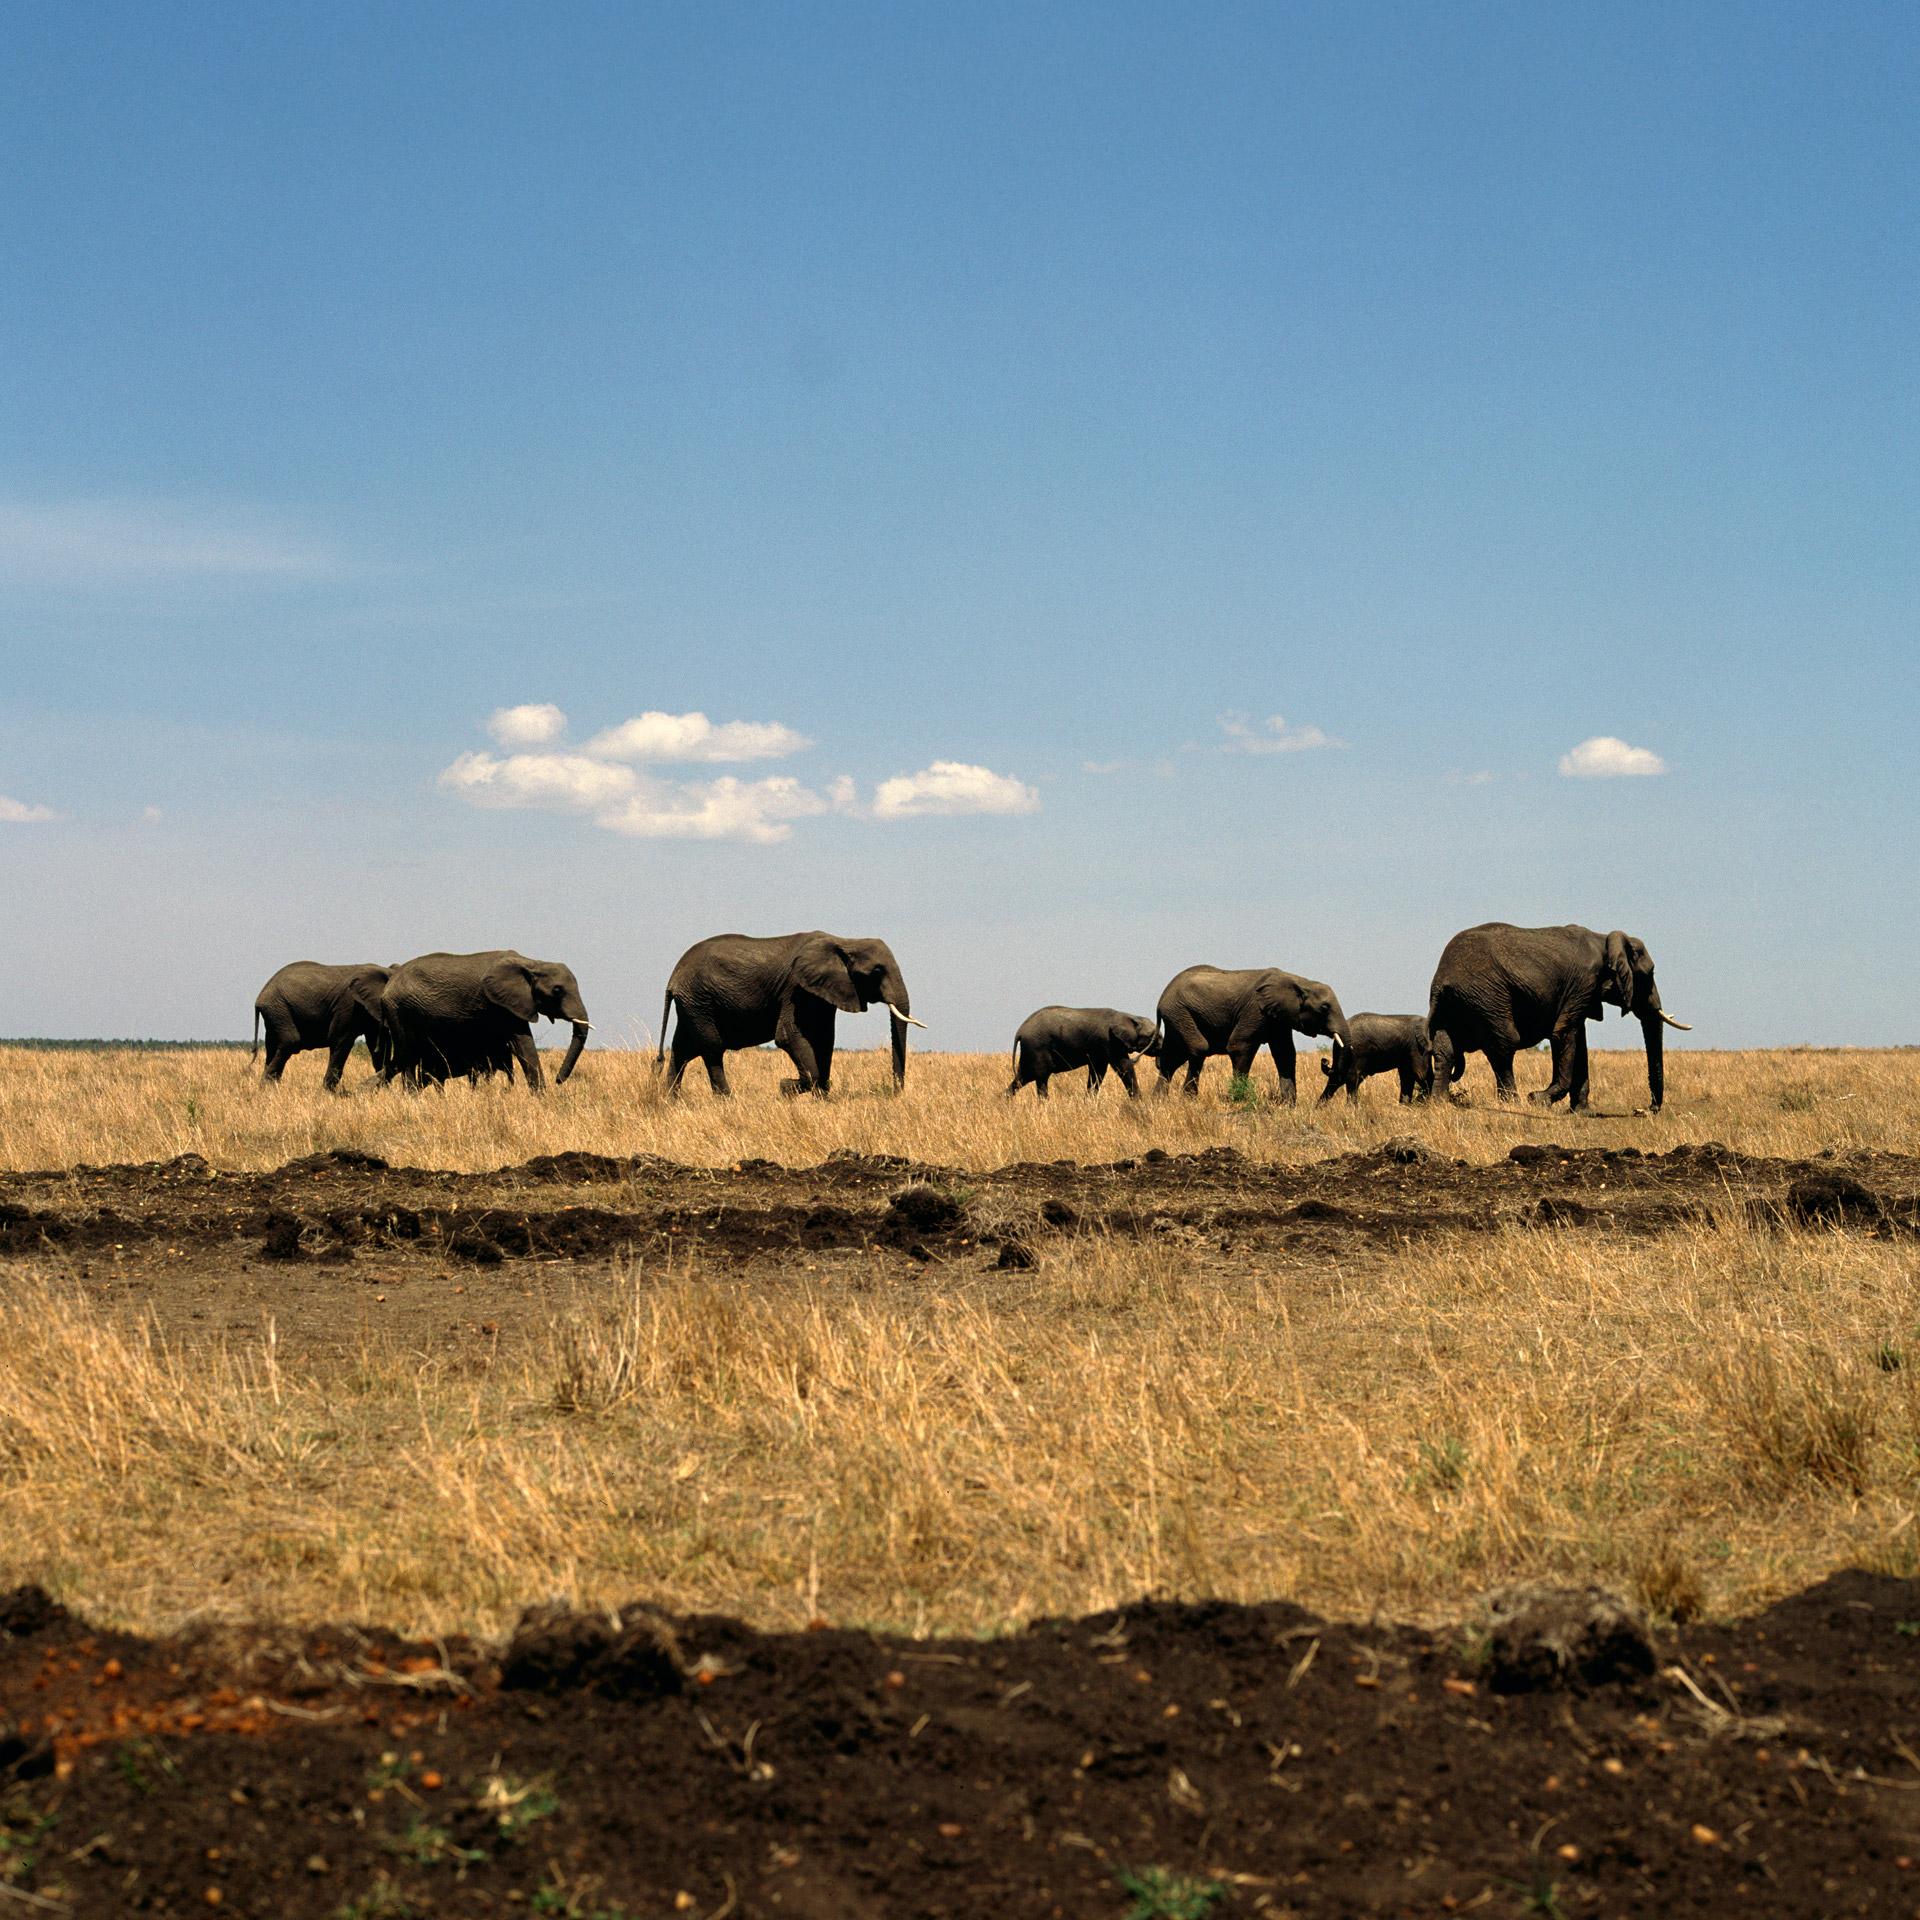 A small group of elephants in Masai Mara in Kenya